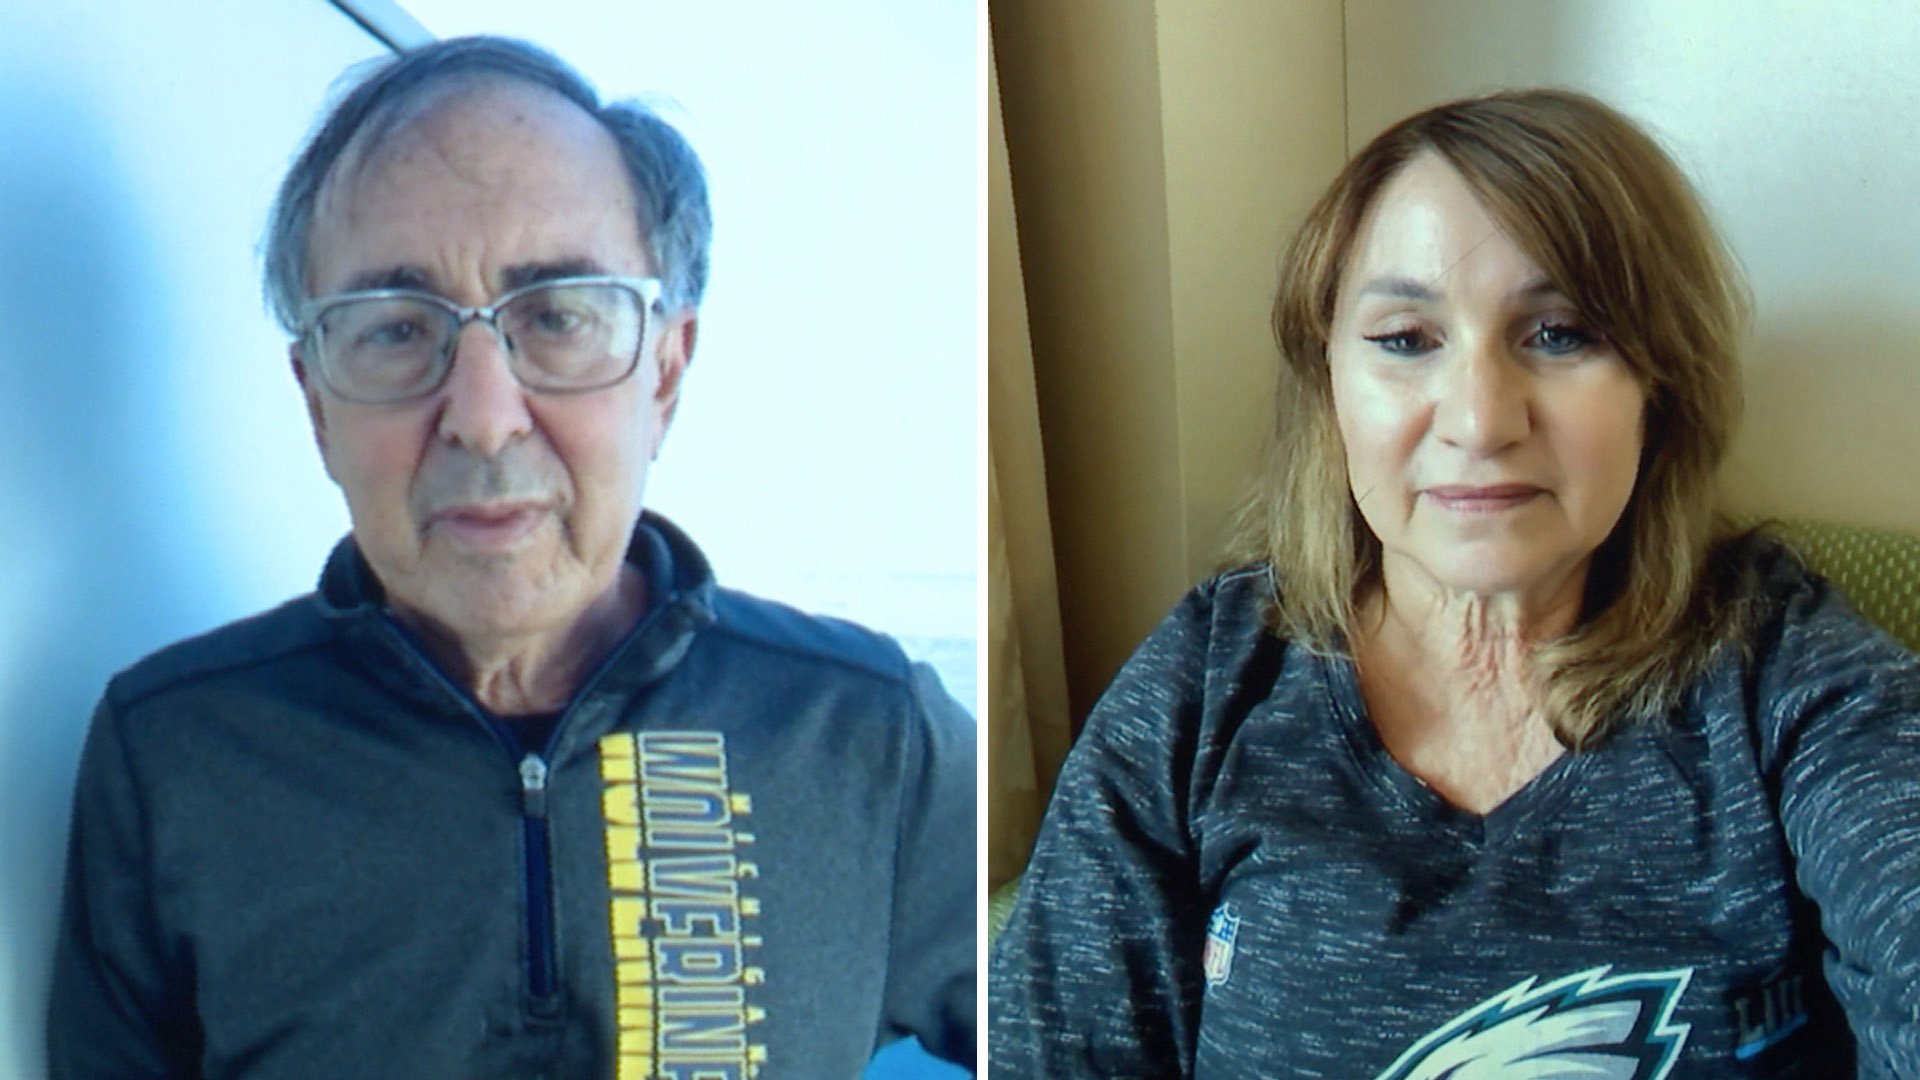 Carl Goldman and Jeri Seratti-Goldman are seen aboard the Diamond Princess cruise ship during a video chat on Feb. 7, 2020.